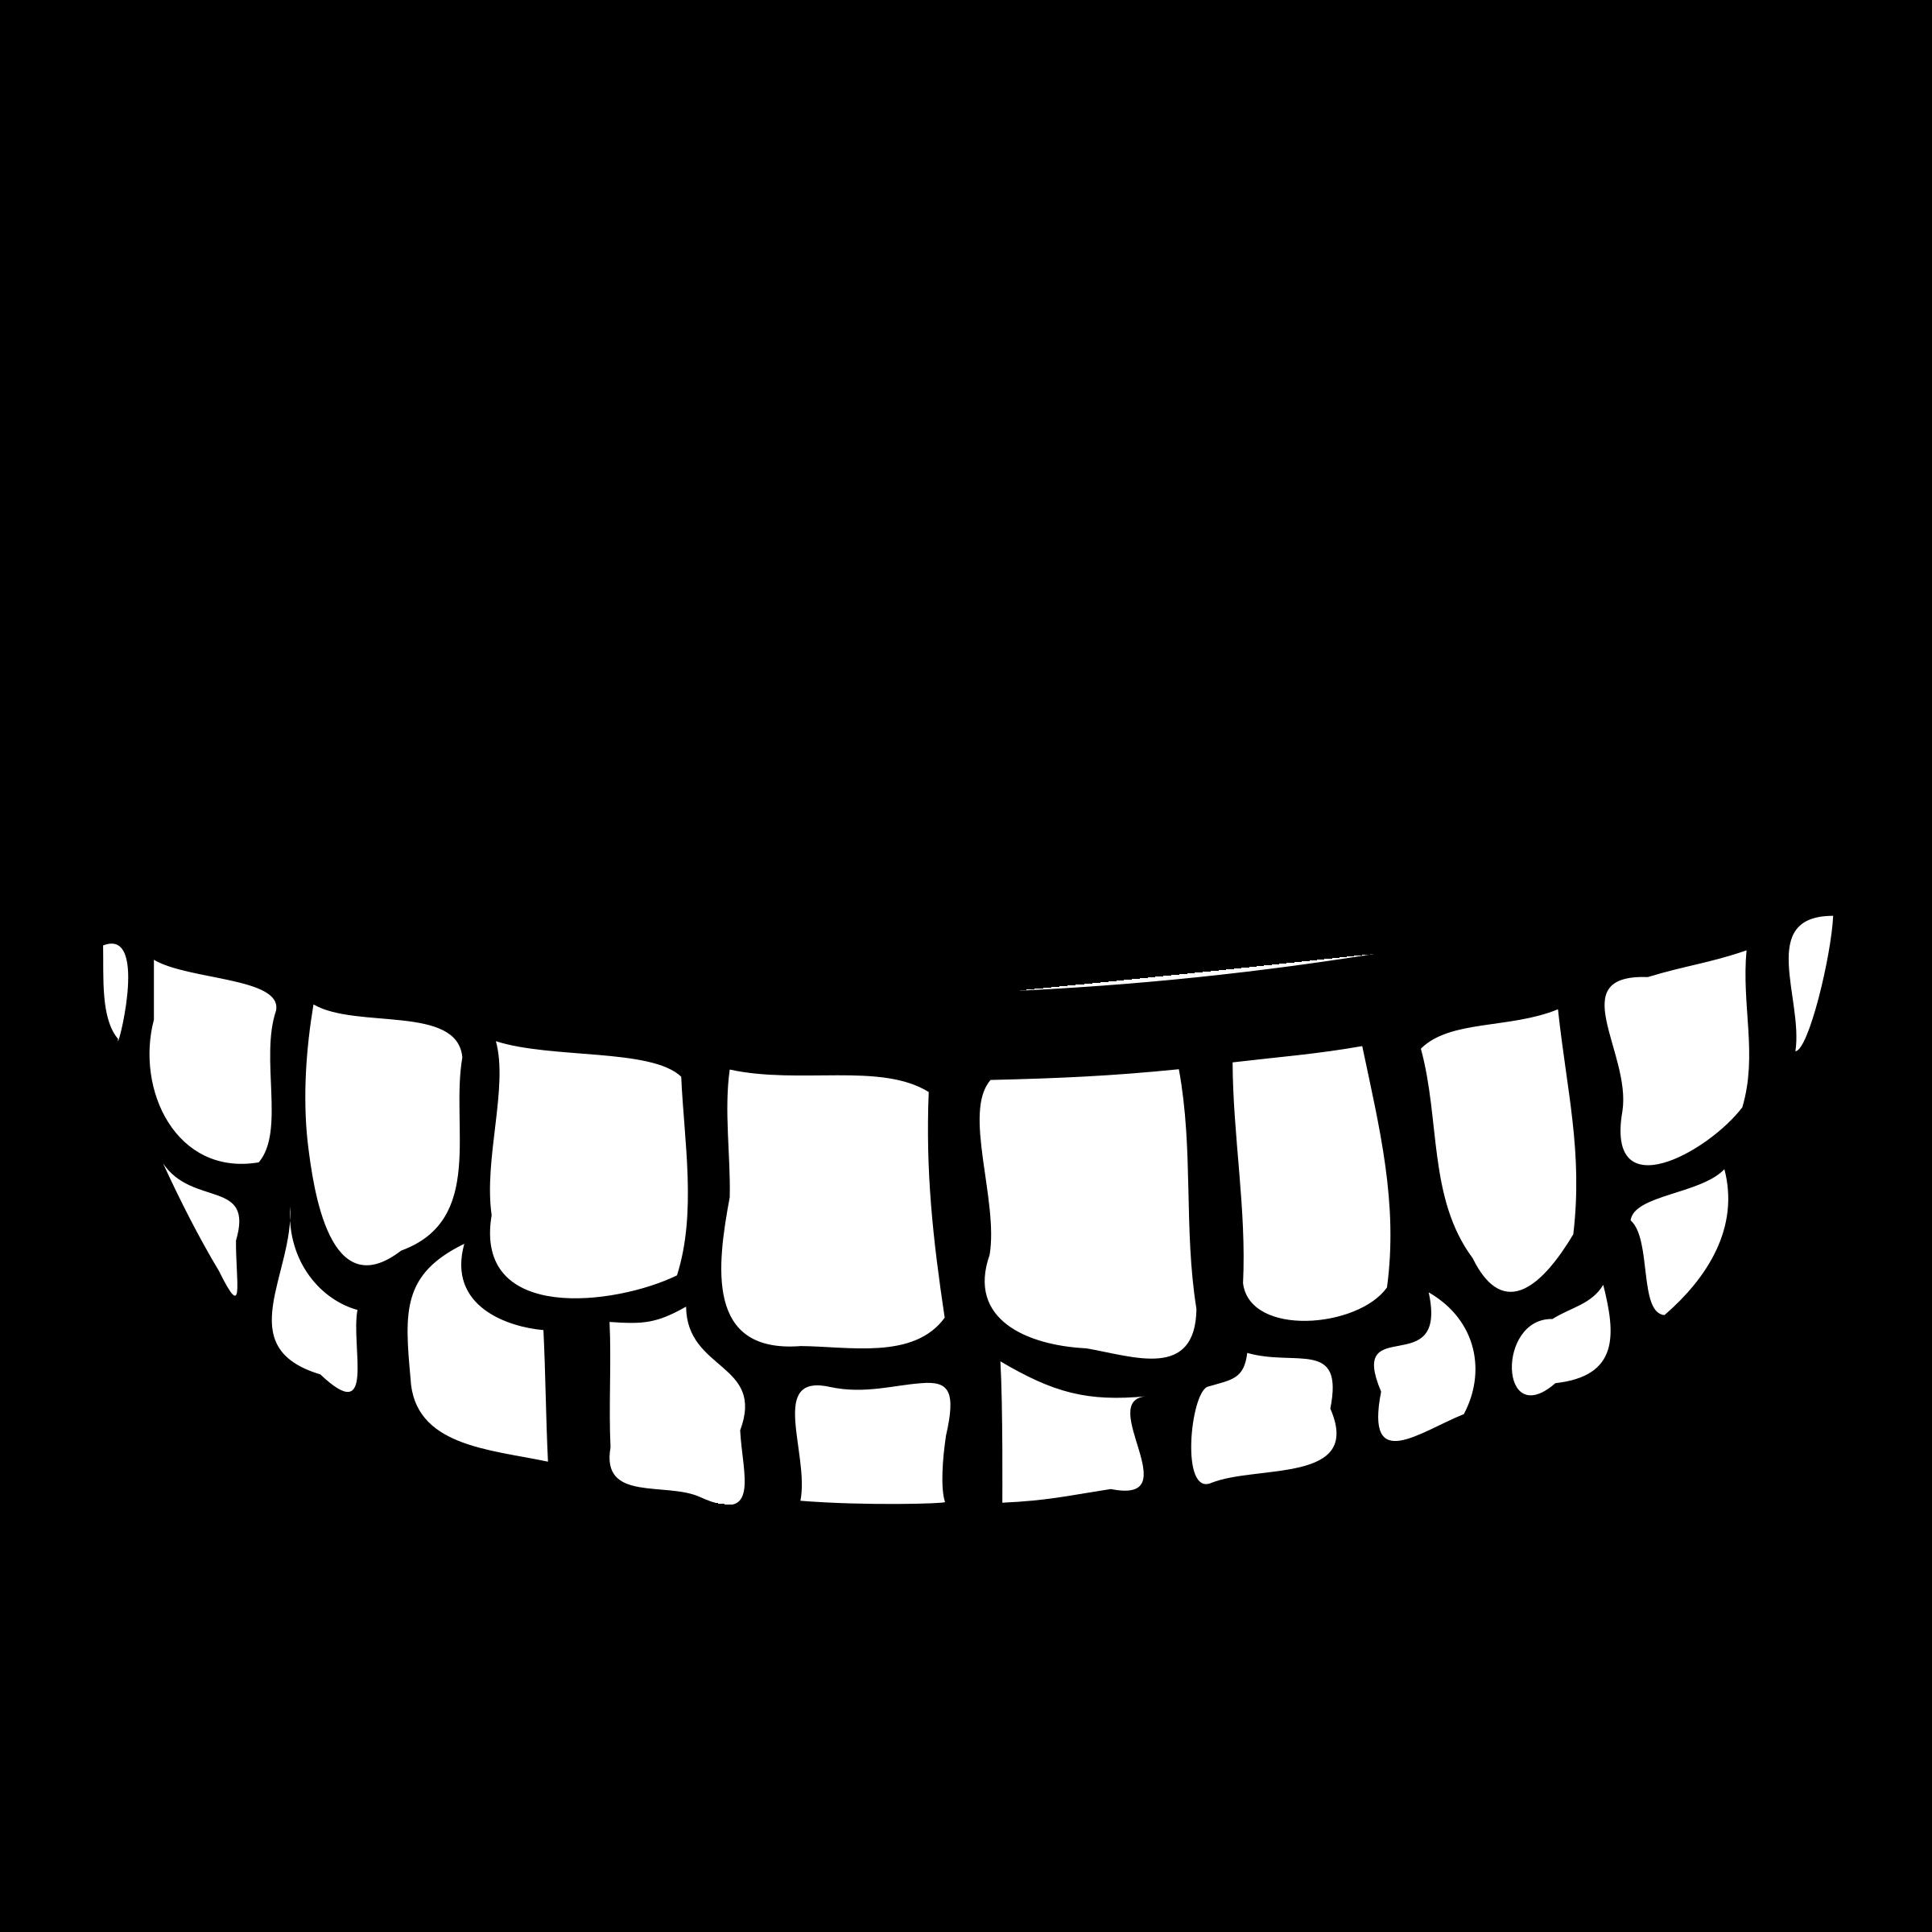 No teeth clipart vector library library Big mouth no teeth clipart - Clip Art Library vector library library